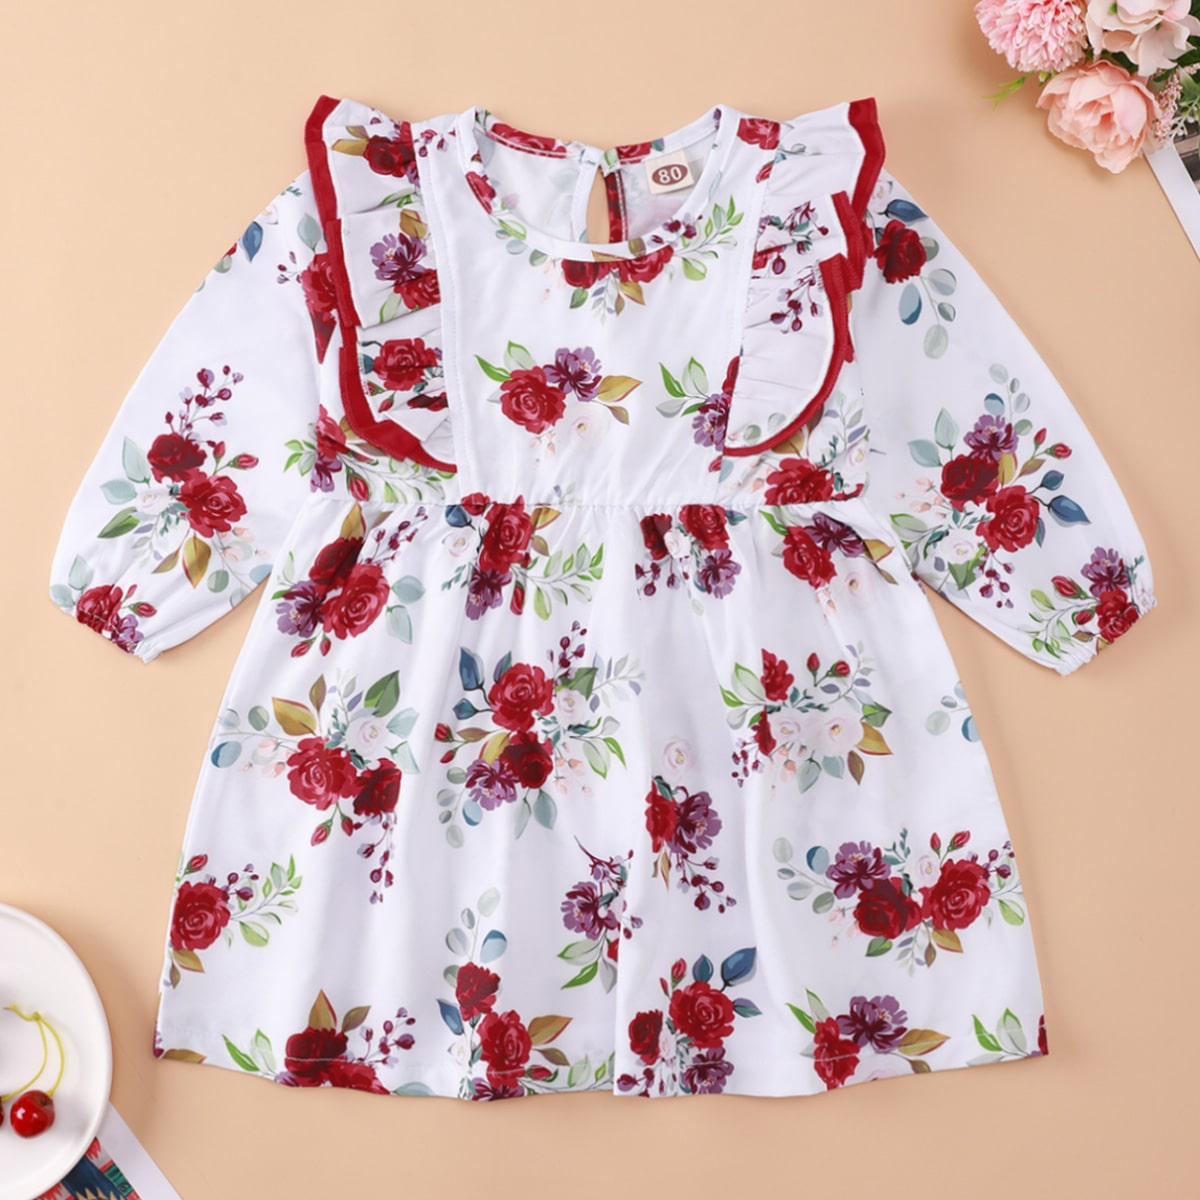 shein Boho Bloemen Baby-jurk Uitgeknipt